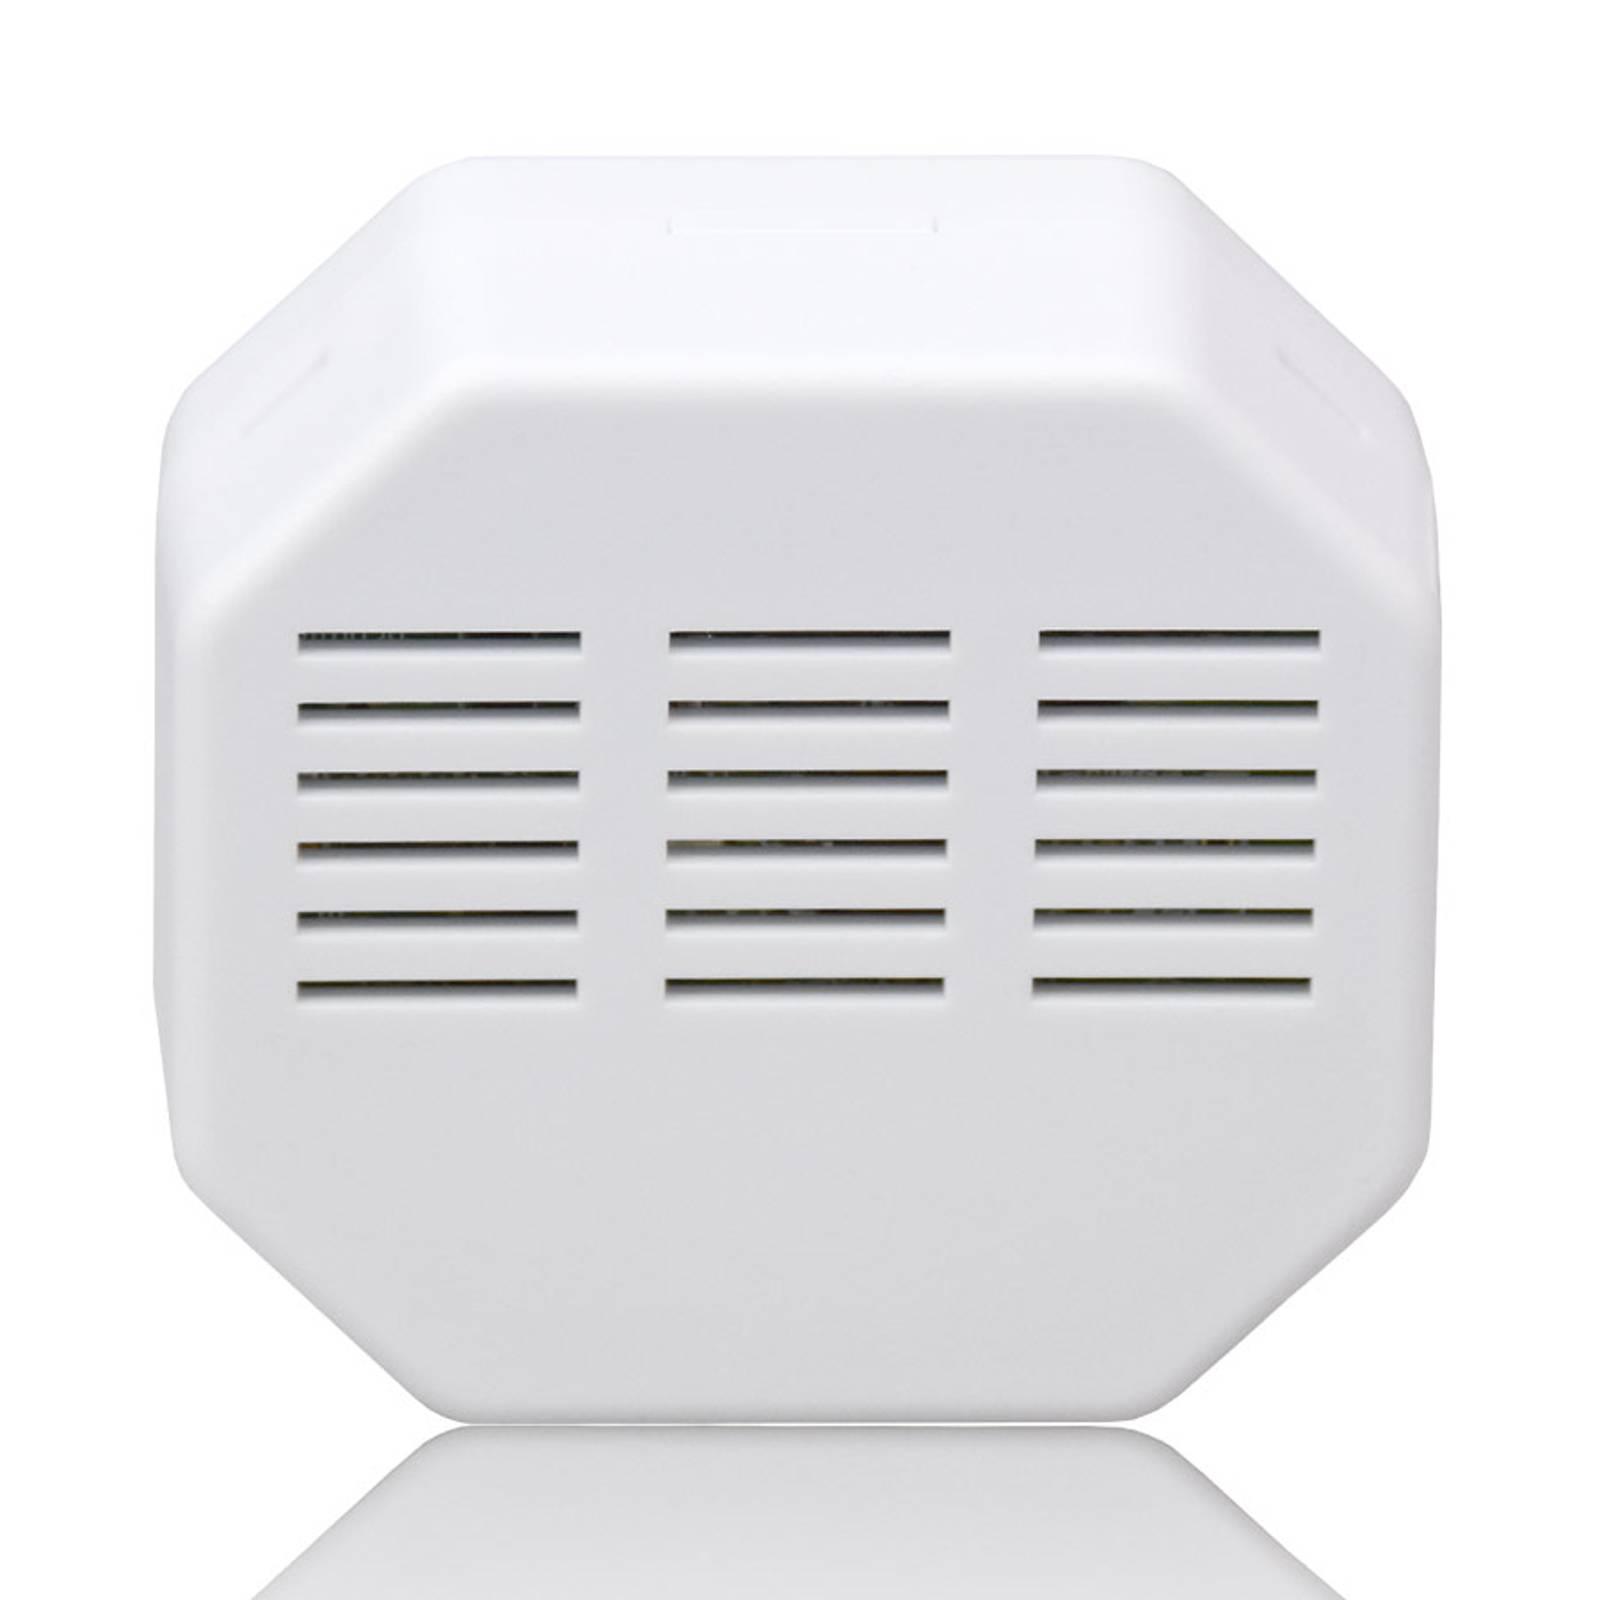 Blaupunkt RRM2-S1 Smart Home Relais Q-sarja